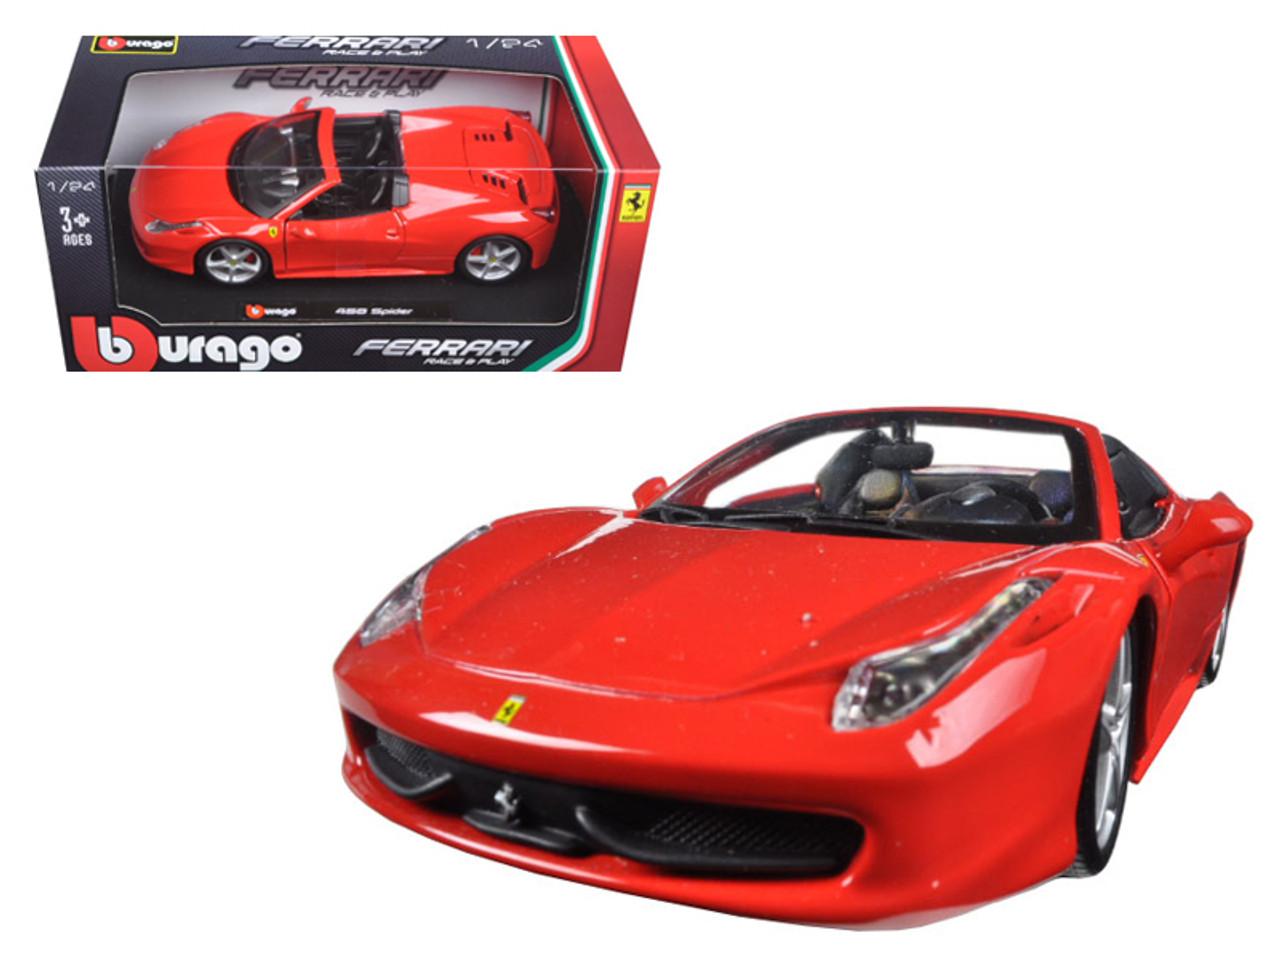 Ferrari 458 Spider Red 1/24 Diecast Model Car by Bburago